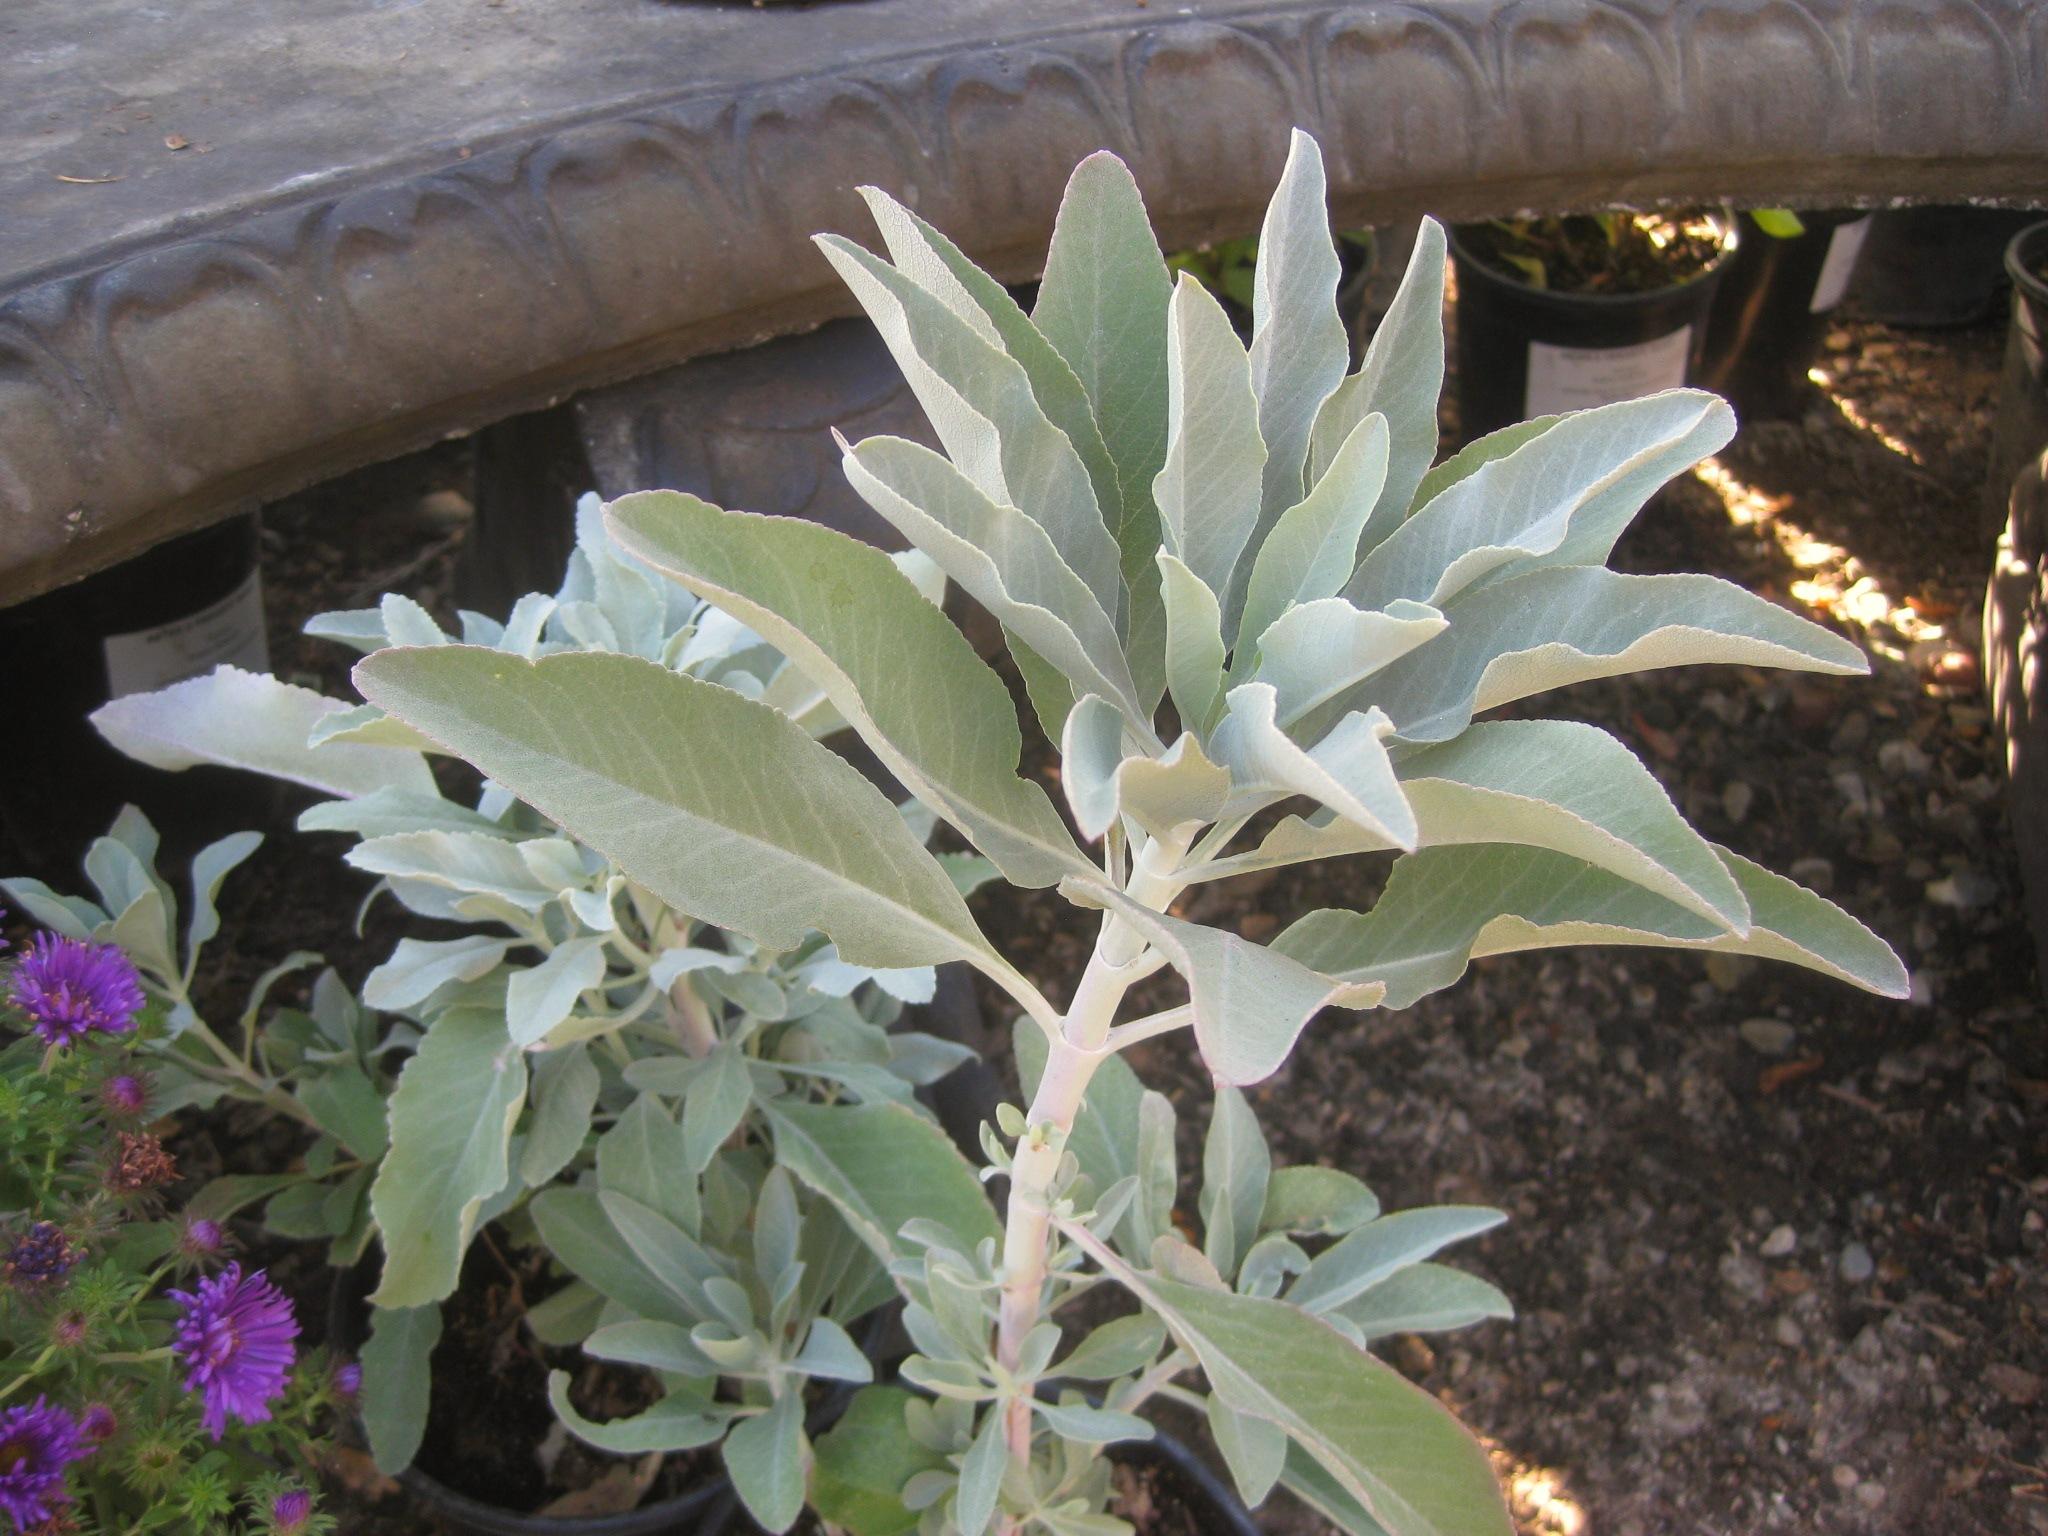 Spicy Mints In The Foothill Garden Sierra Foothill Garden